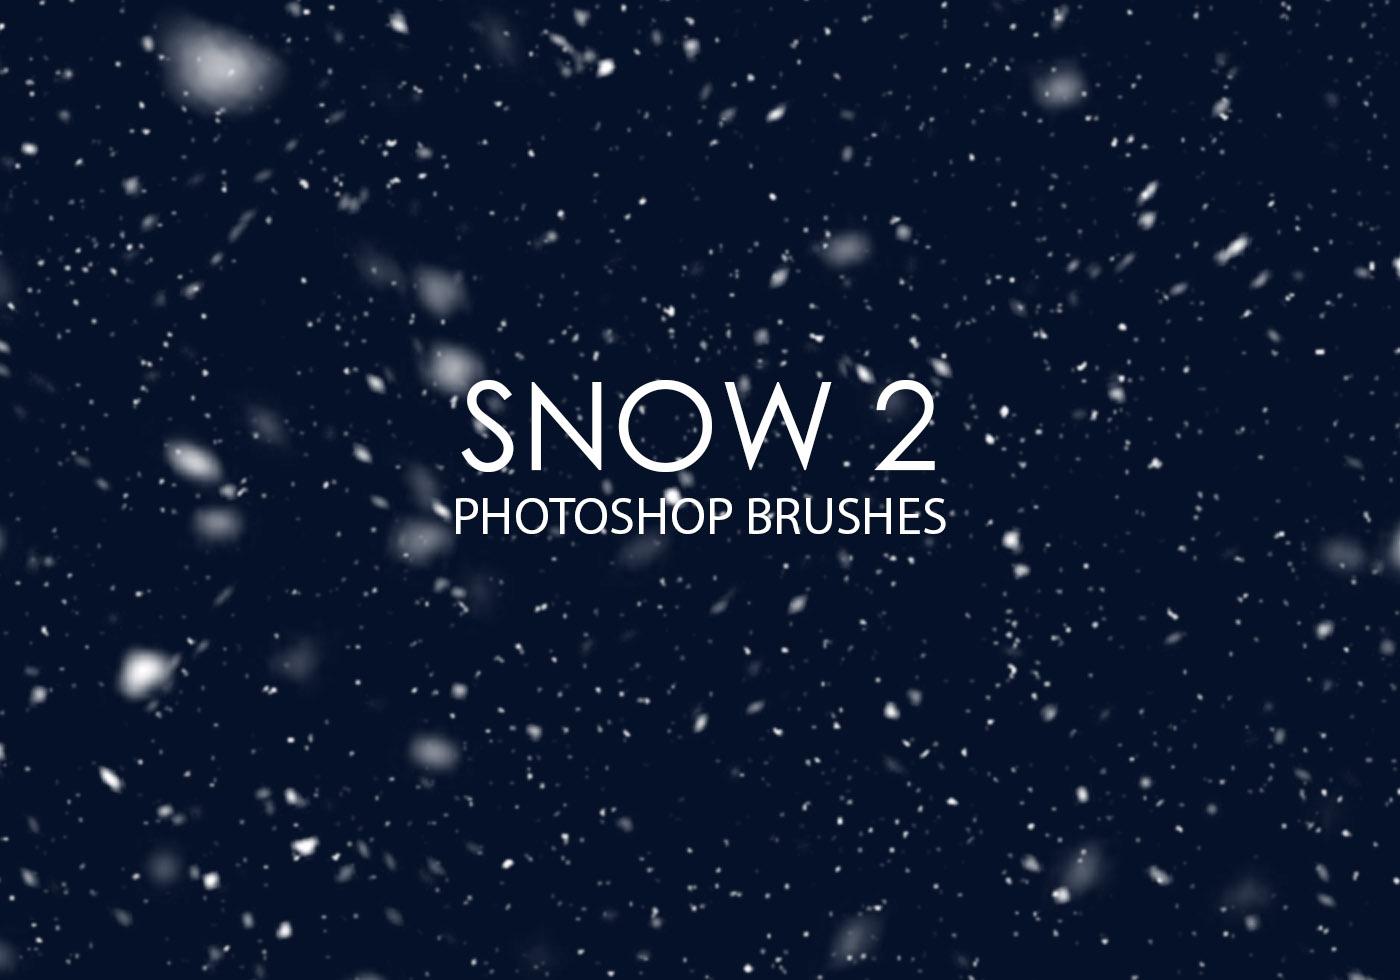 Black Silver Glitter Wallpaper Free Snow Photoshop Brushes 2 Free Photoshop Brushes At